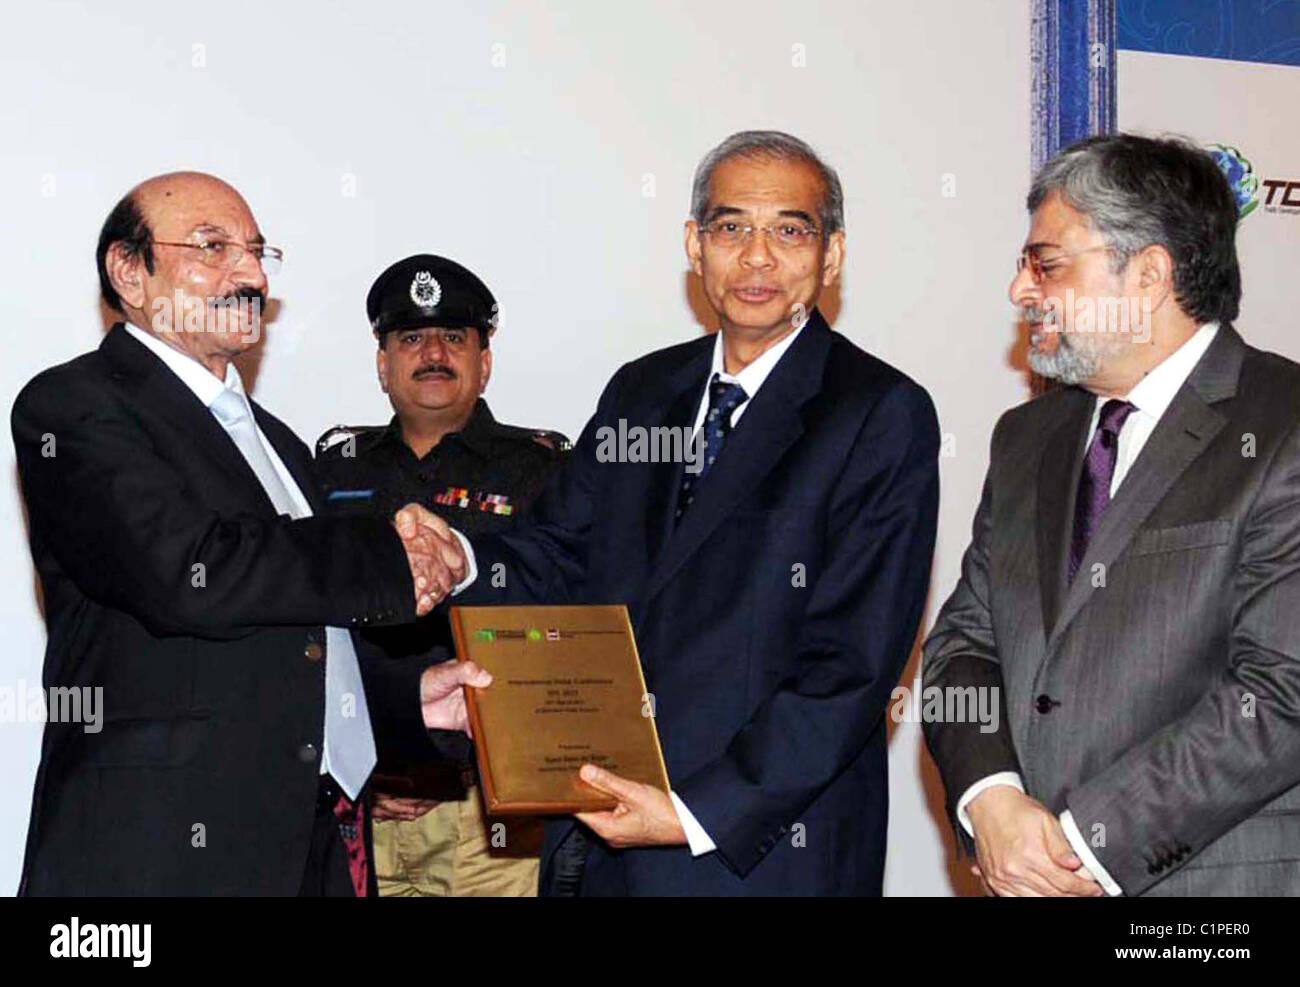 Provincial Chief Minister, Syed Qaim Ali Shah gives away souvenir to Tan Sri Dato Dr.Syed Jalaluddin Syed Salim Stock Photo